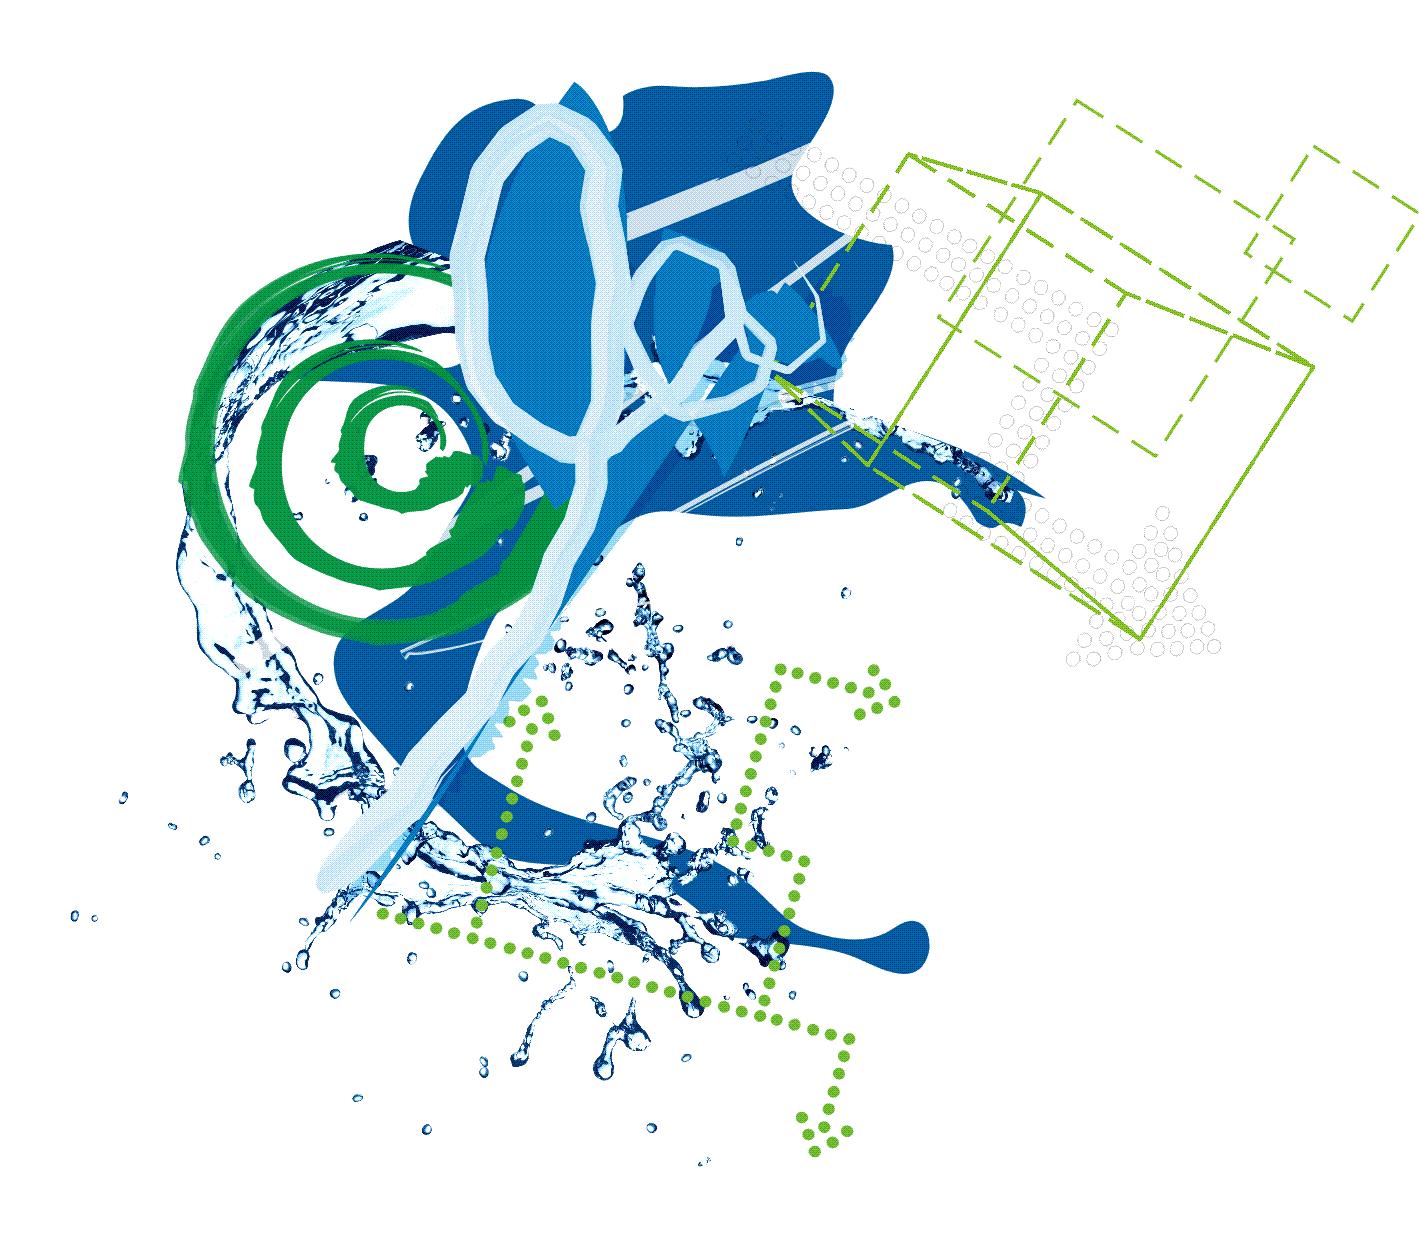 skye-shopfitters-logo-image.png